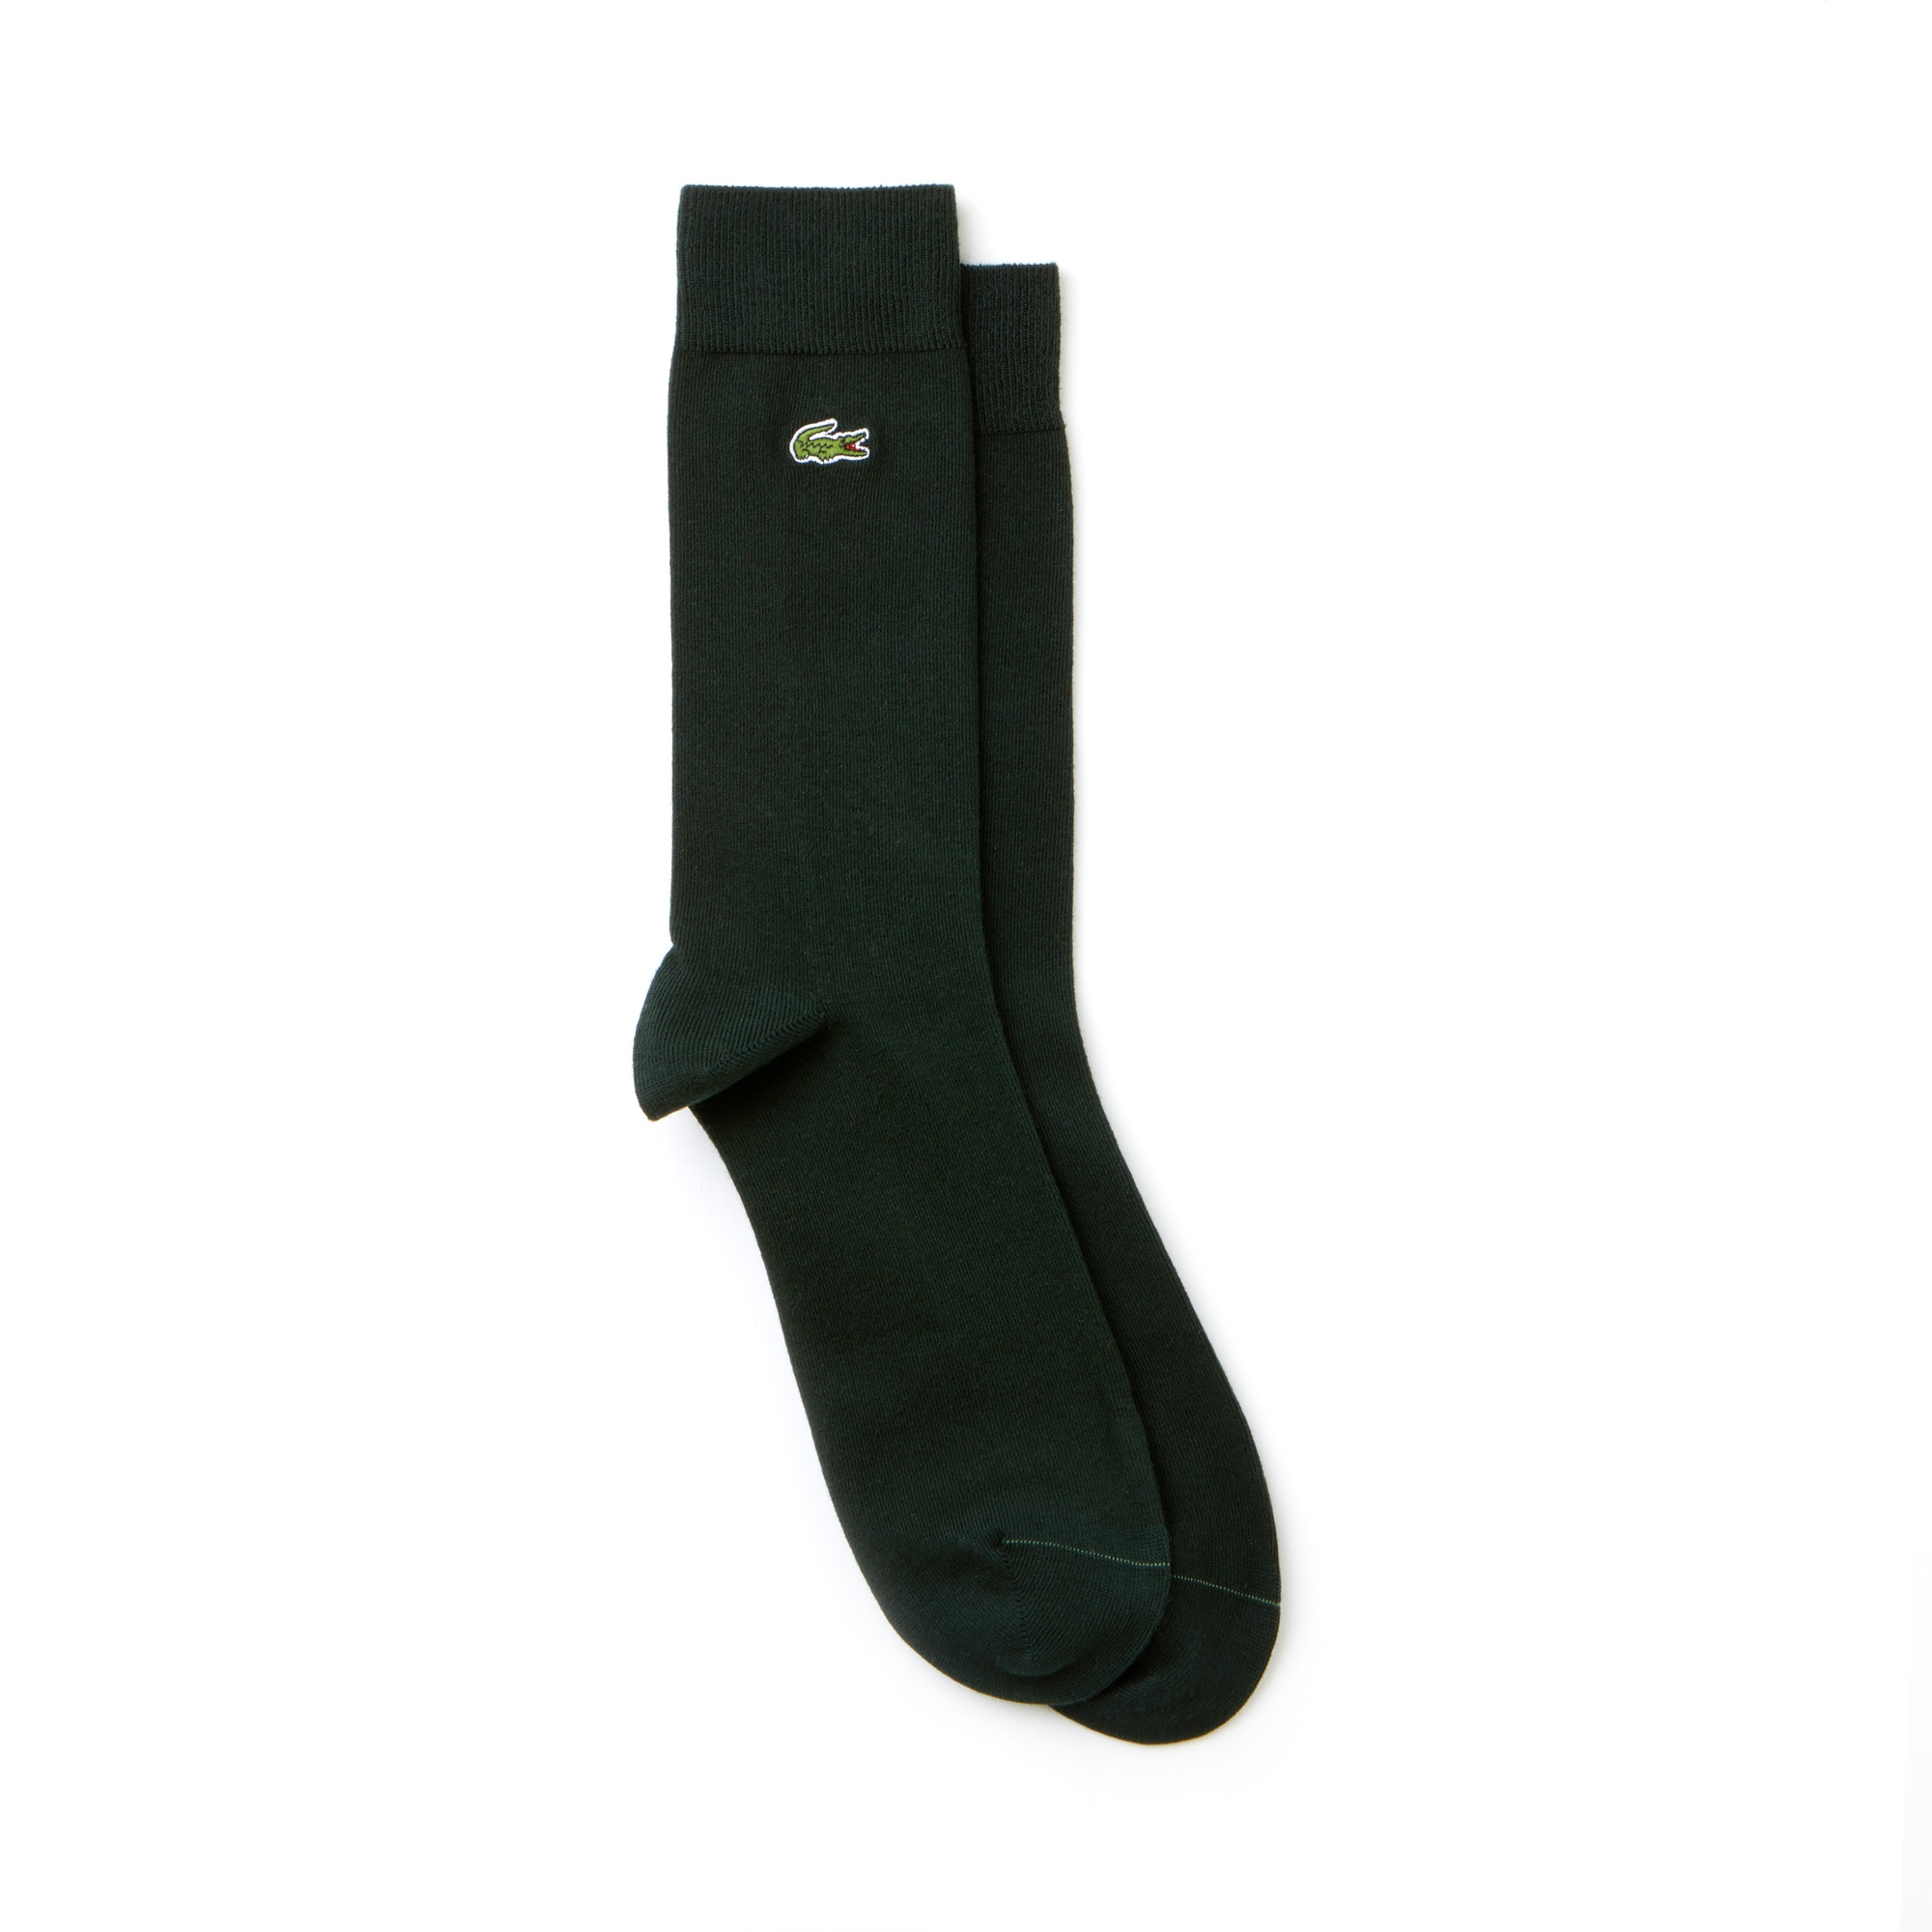 Men's Socks in unicolour jersey